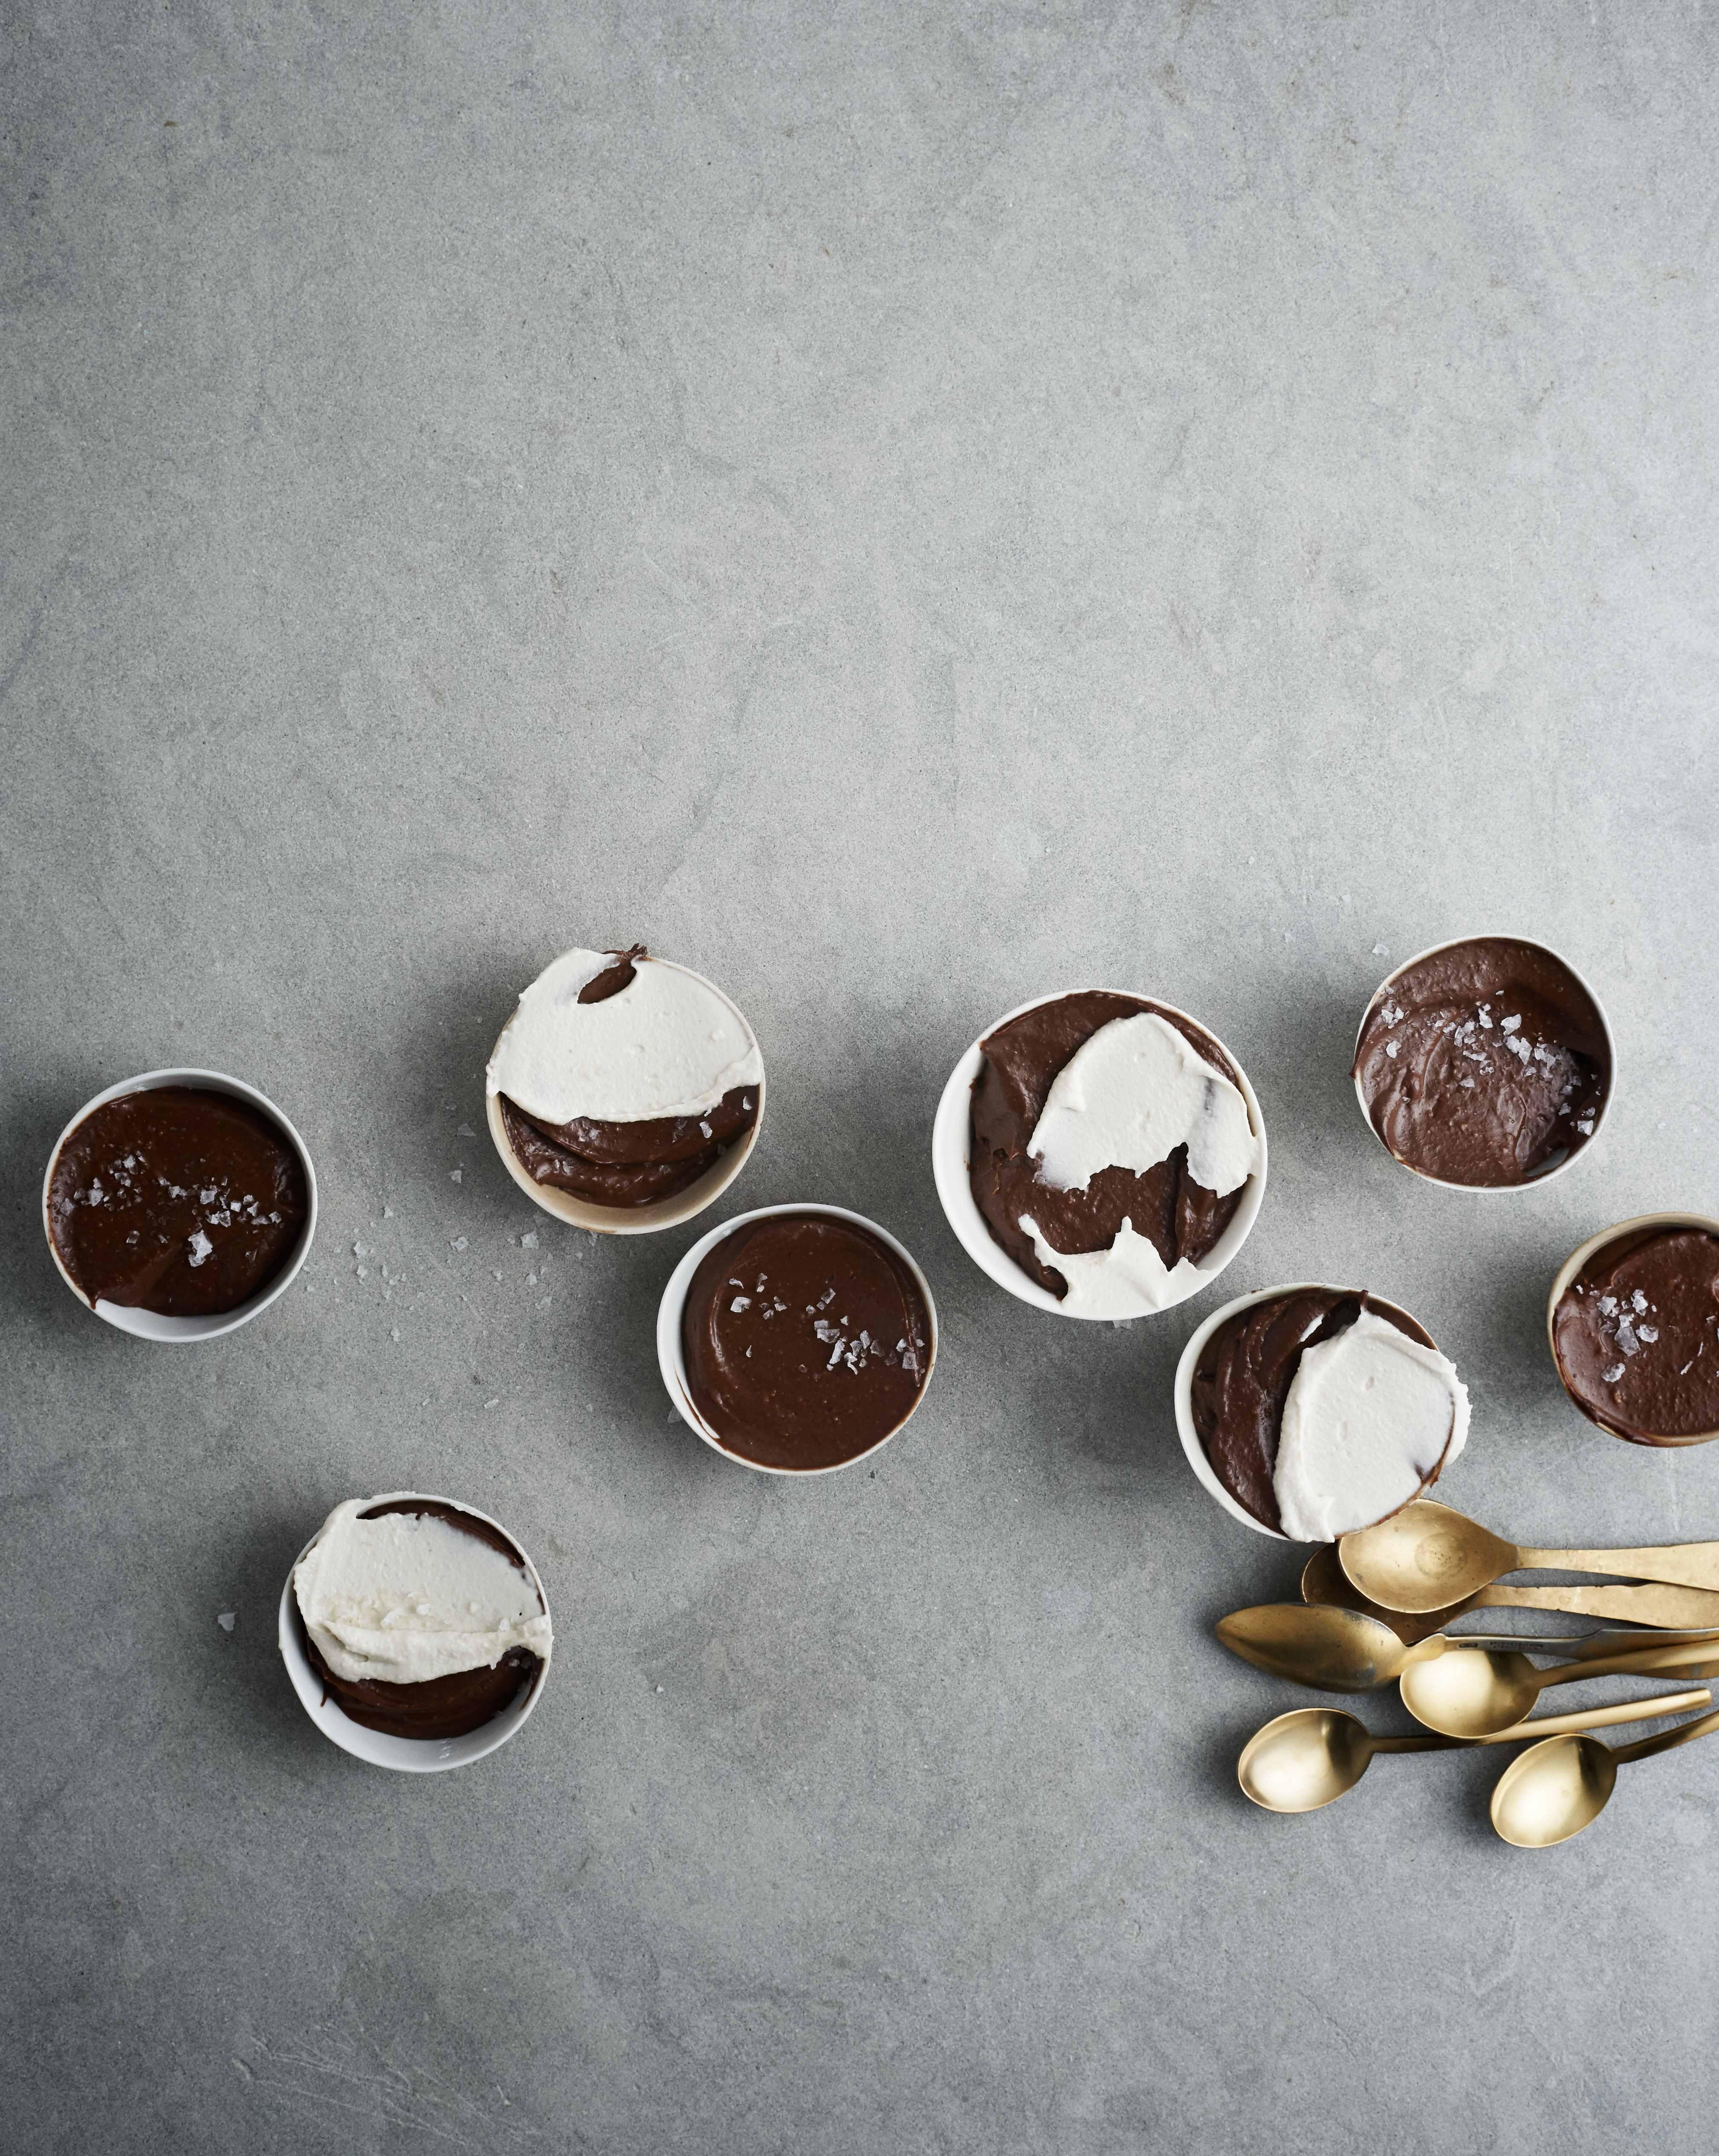 Recipe: Make Gwyneth Paltrow's Chocolate Mousse